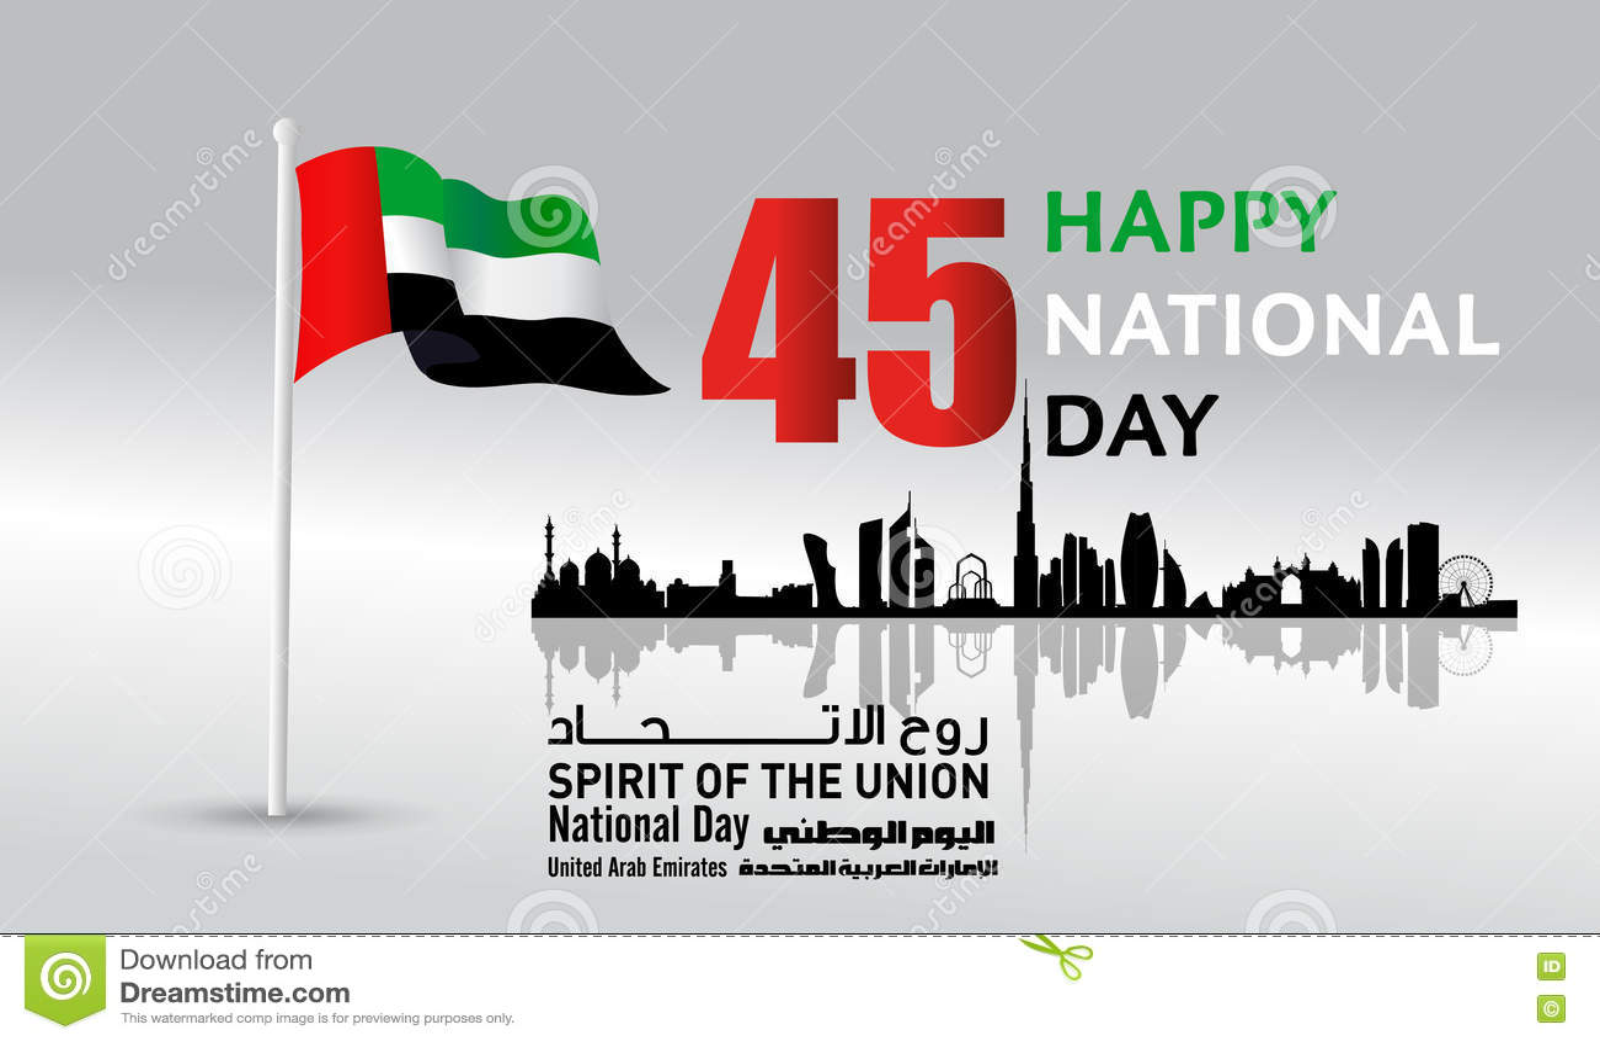 Quotes Wallpaper Zip United Arab Emirates Uae National Day Background Stock